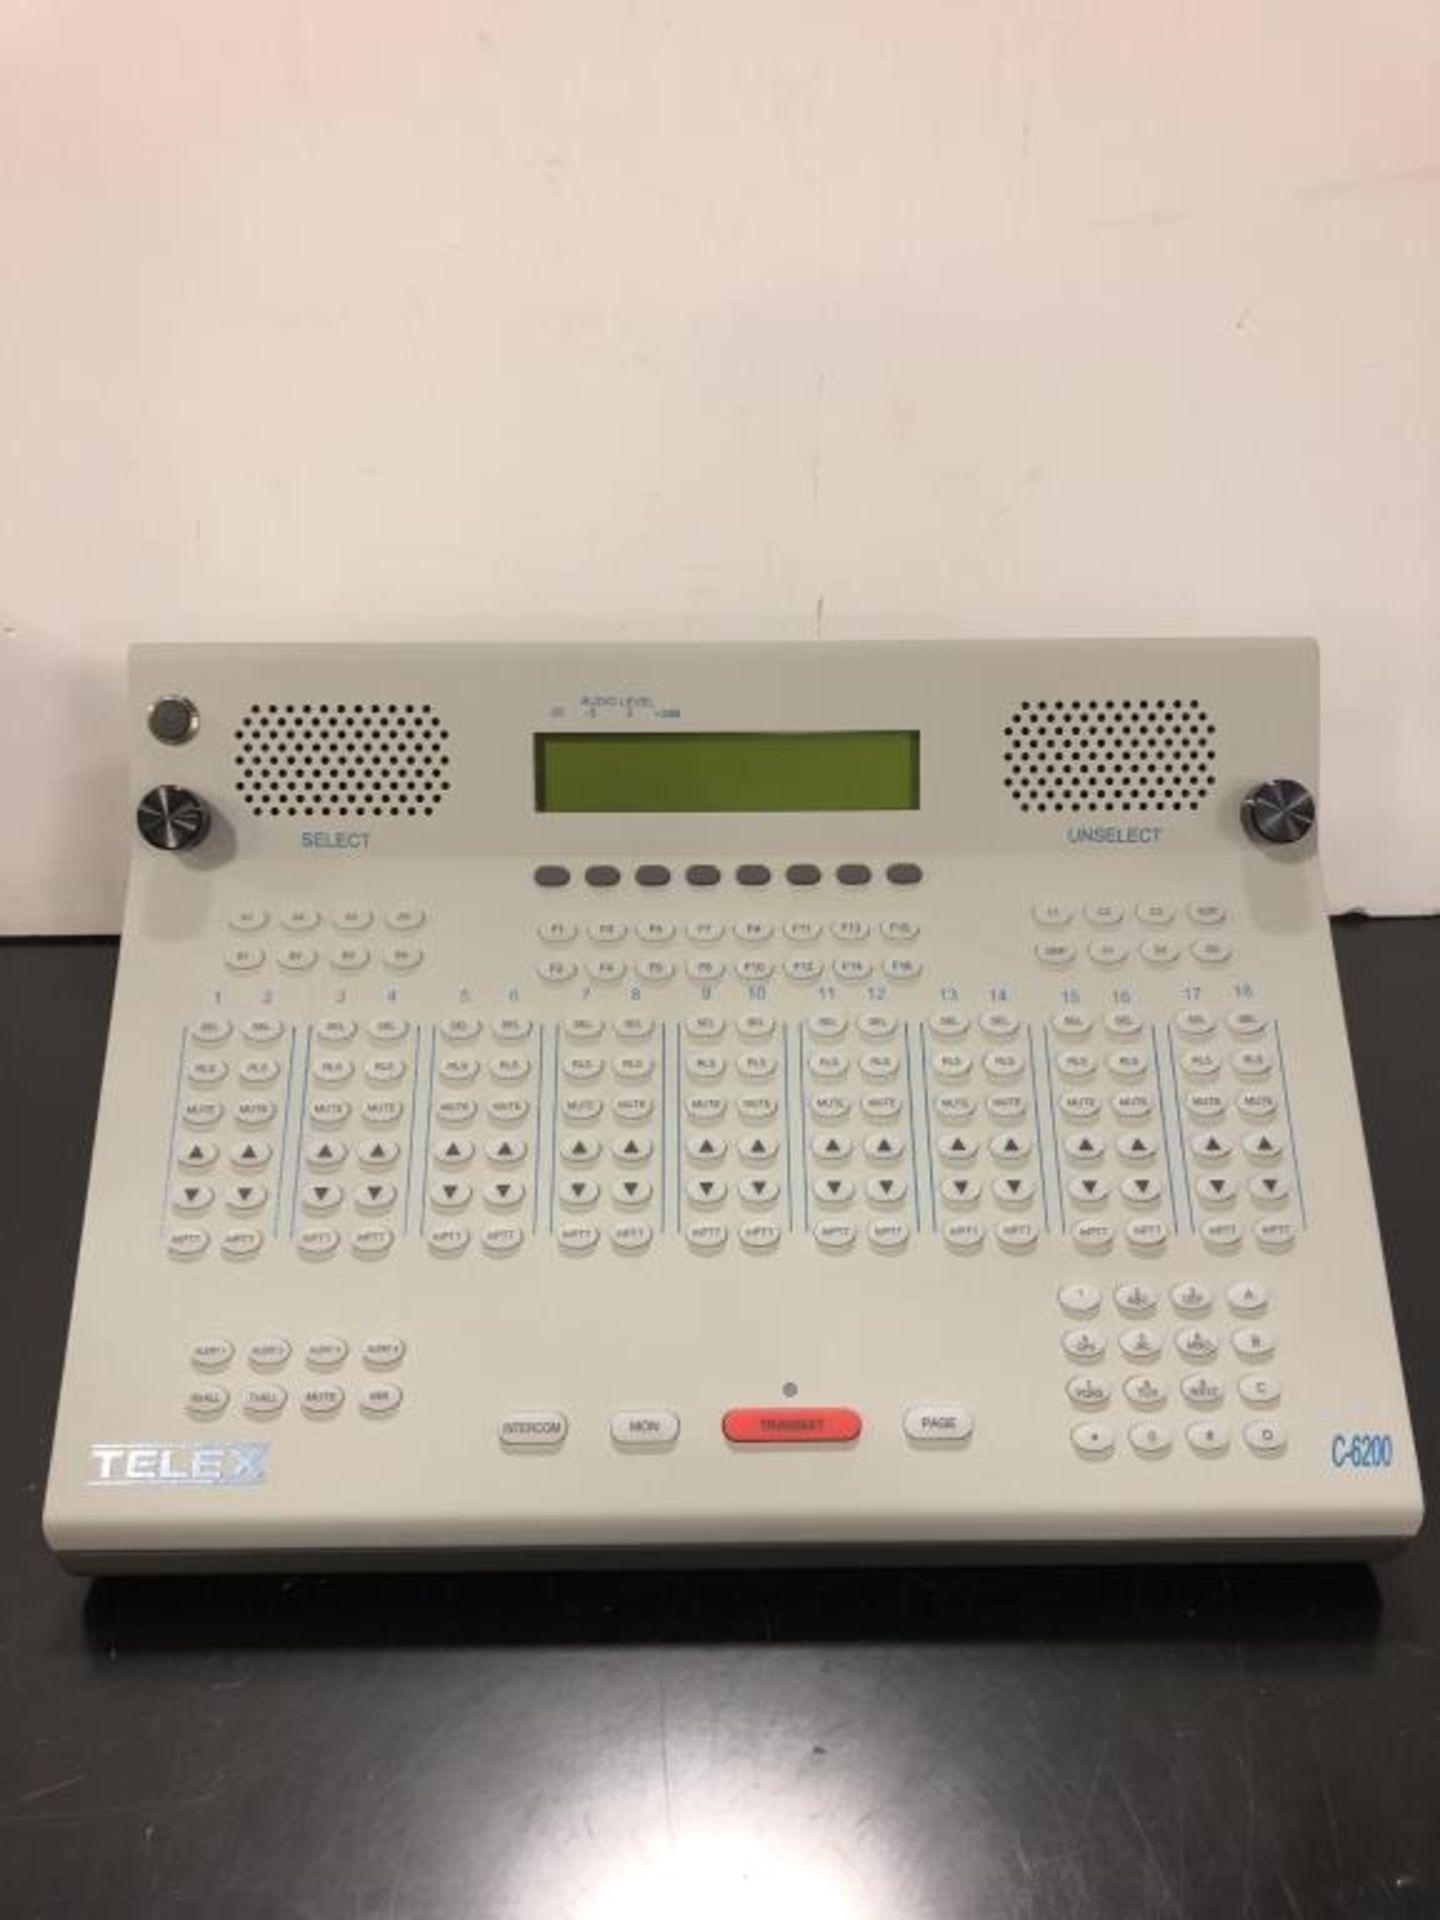 Lot 267 - VOIP Radio Dispatch Control